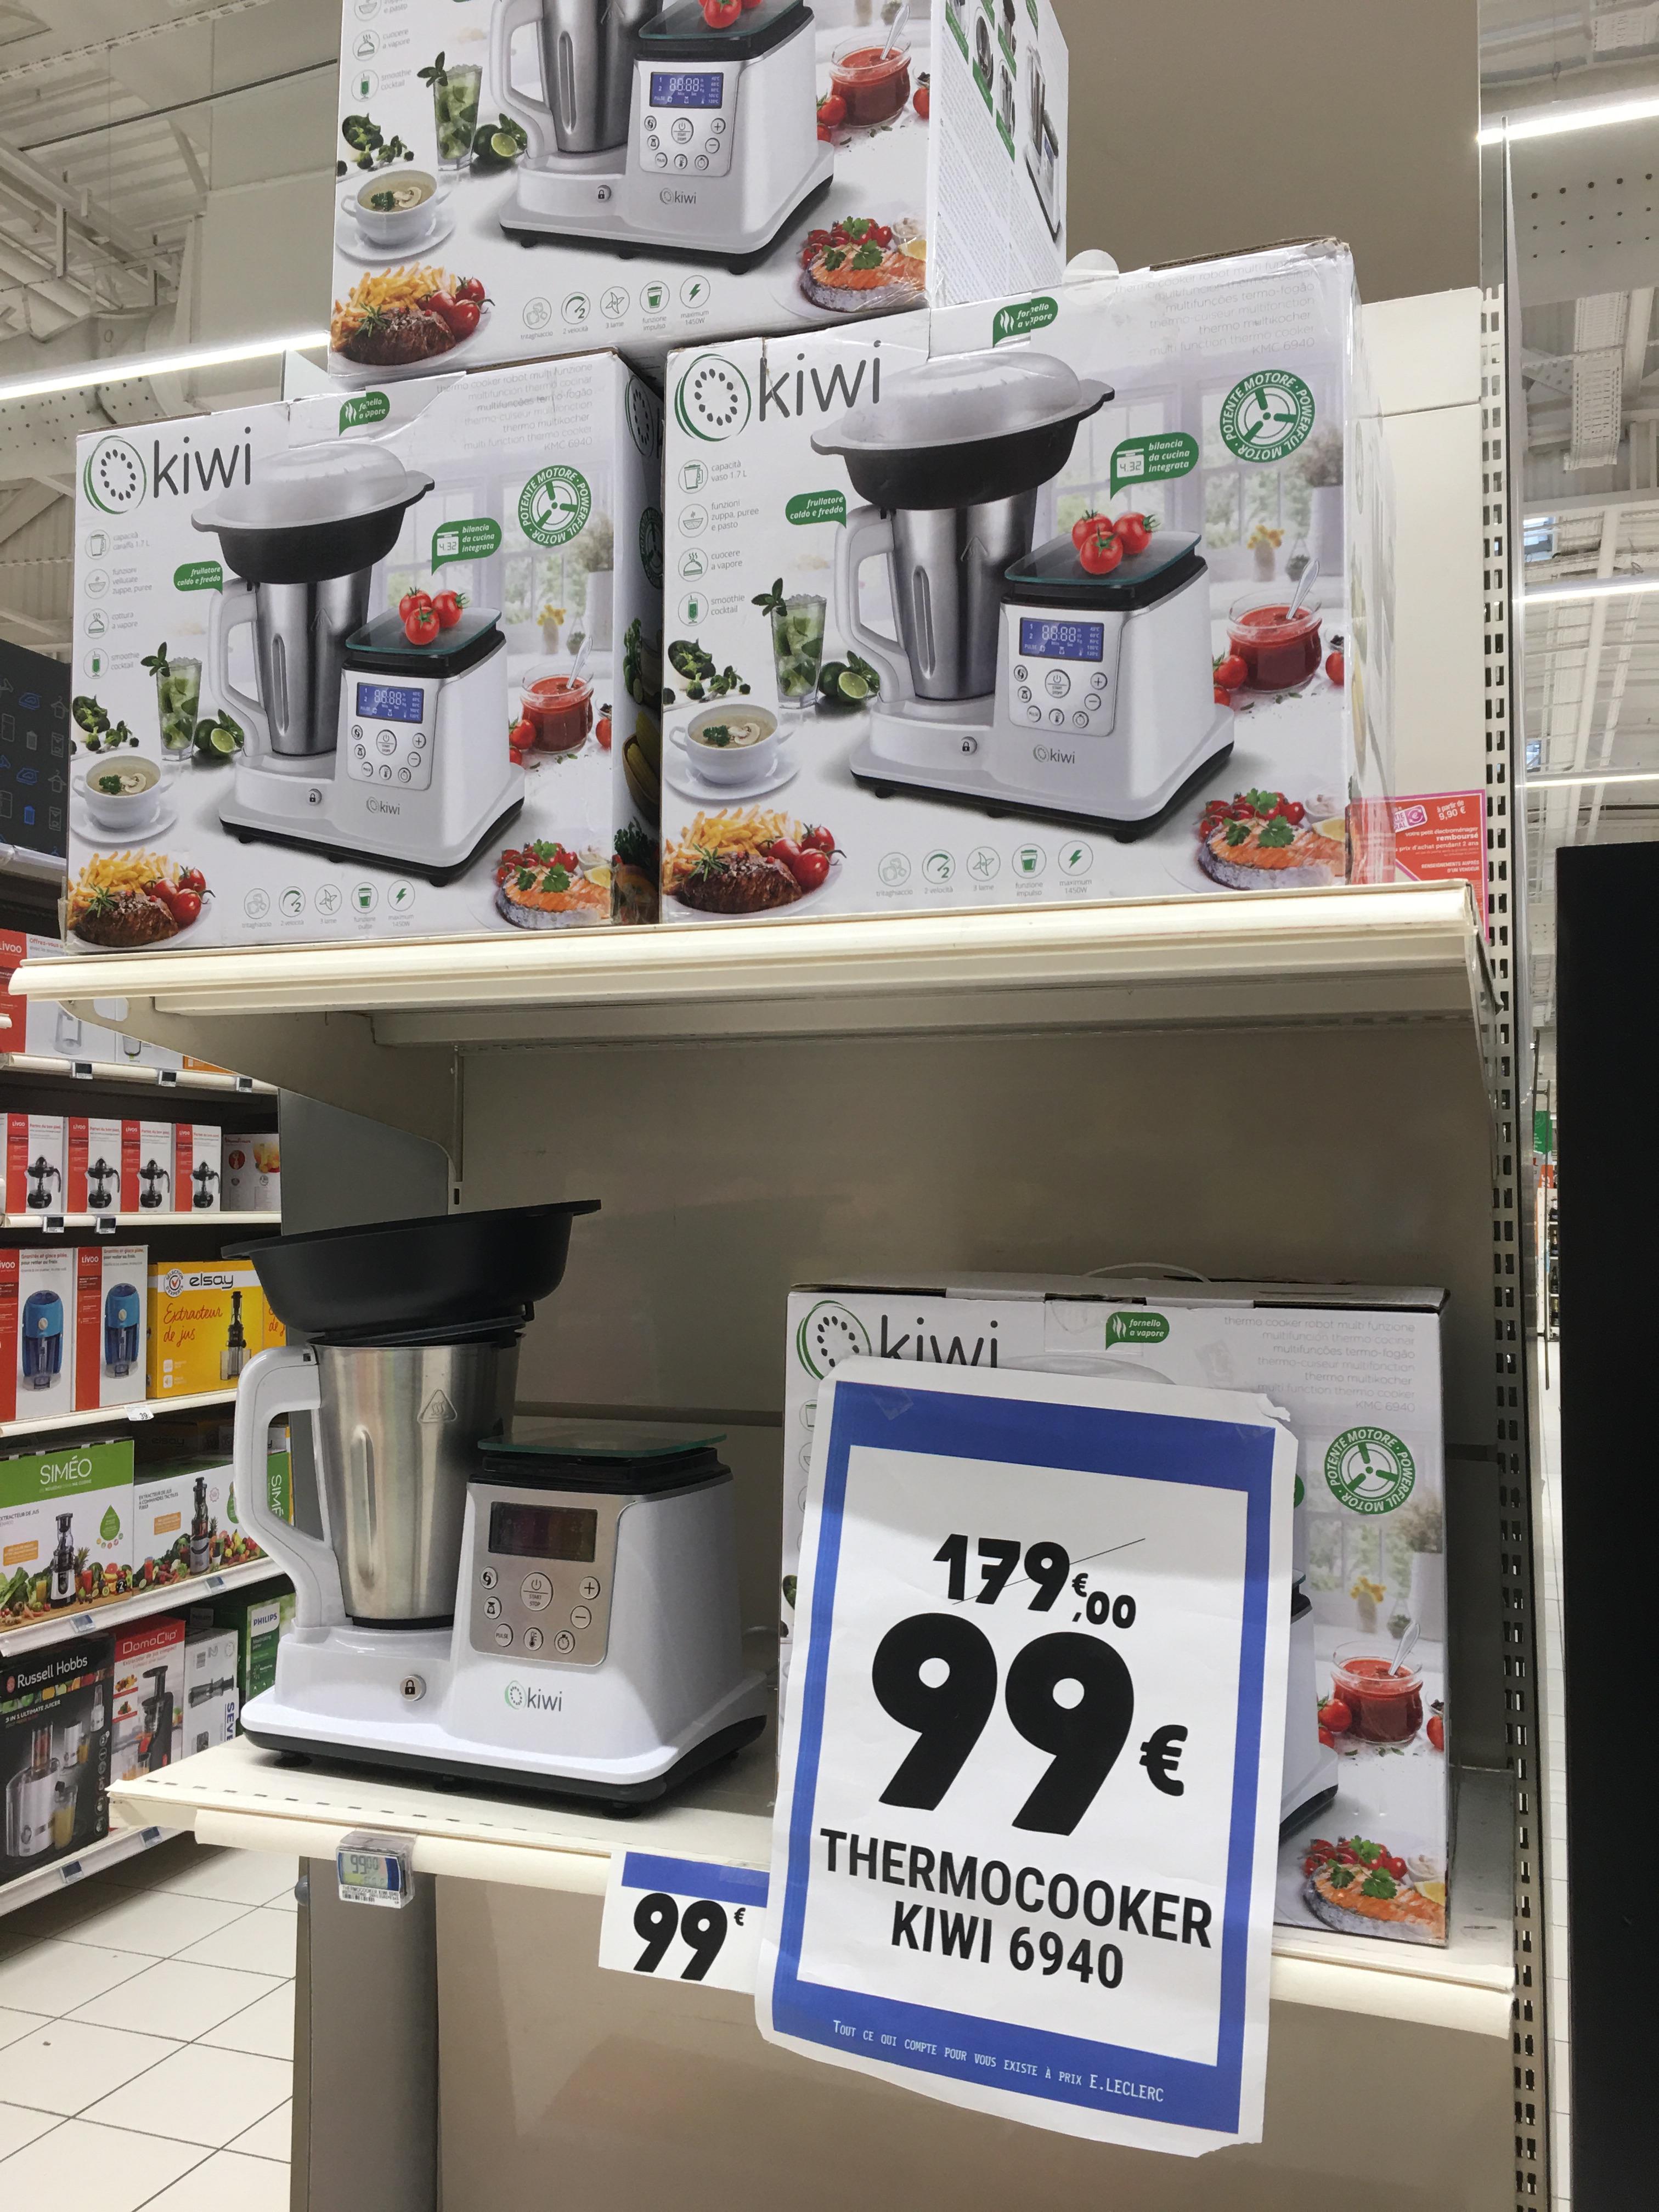 Robot de cuisine multifonction Kiwi Thermocooker KMC-6940 - Perpignan Sud (66)